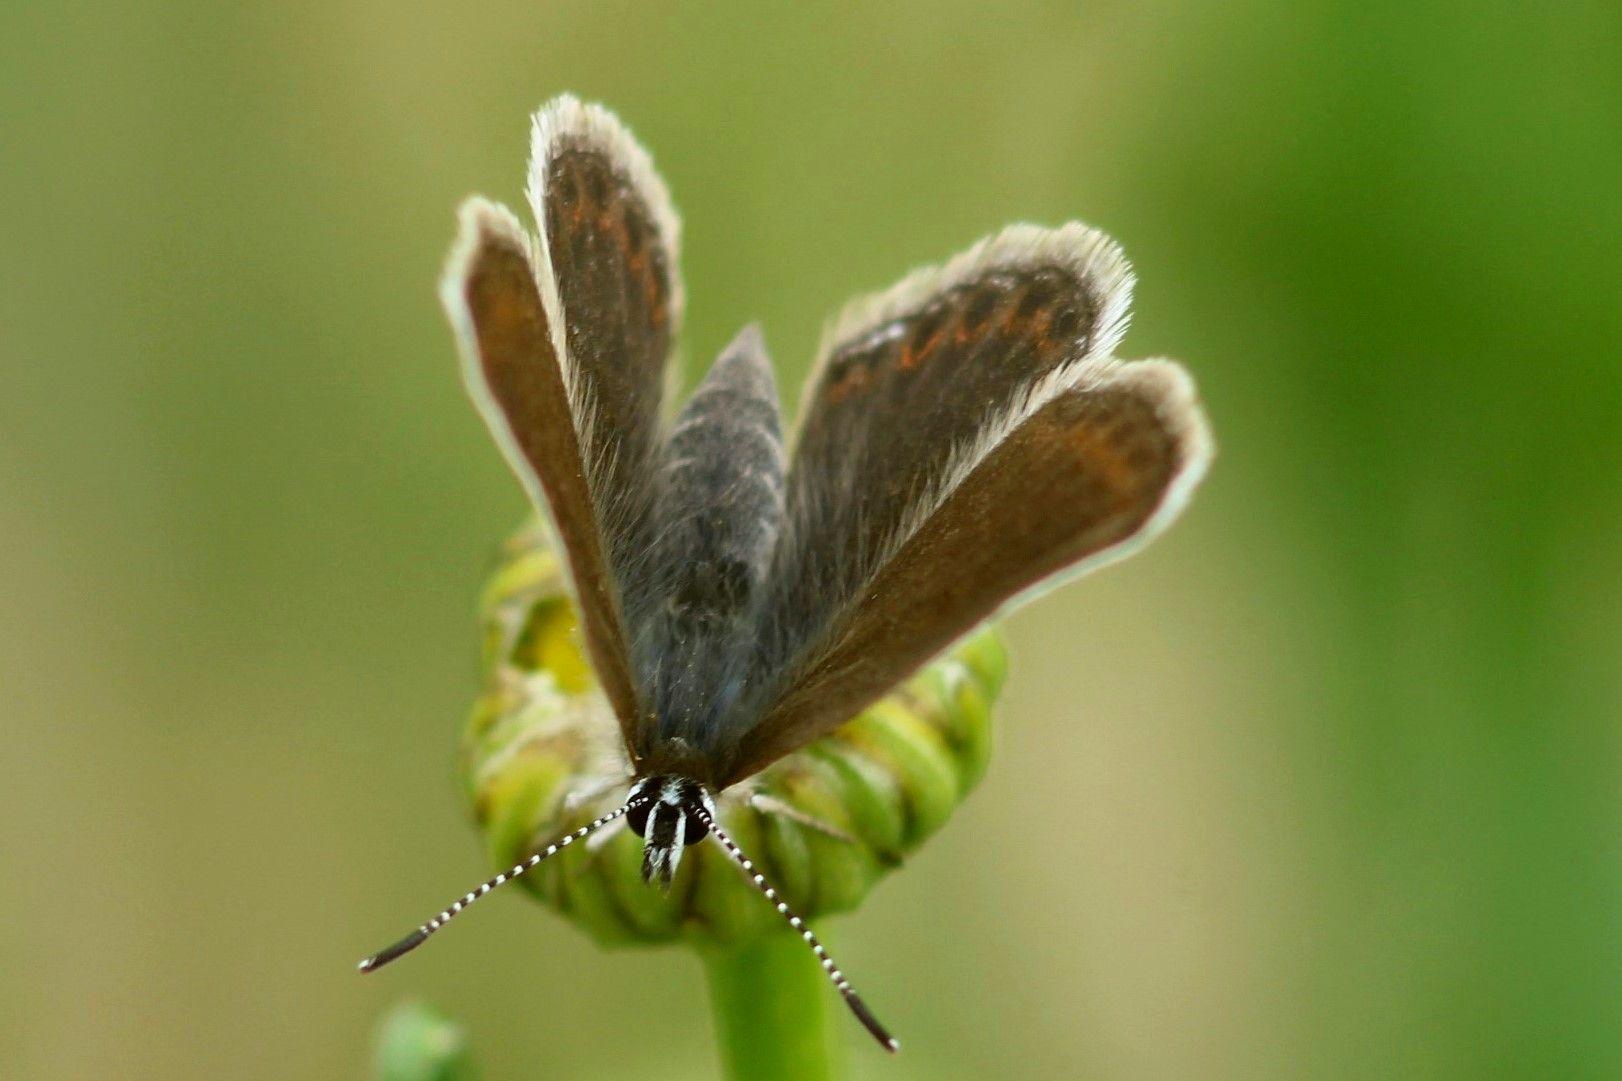 Бабочка (мохнатая) природа лето насекомые жара красота